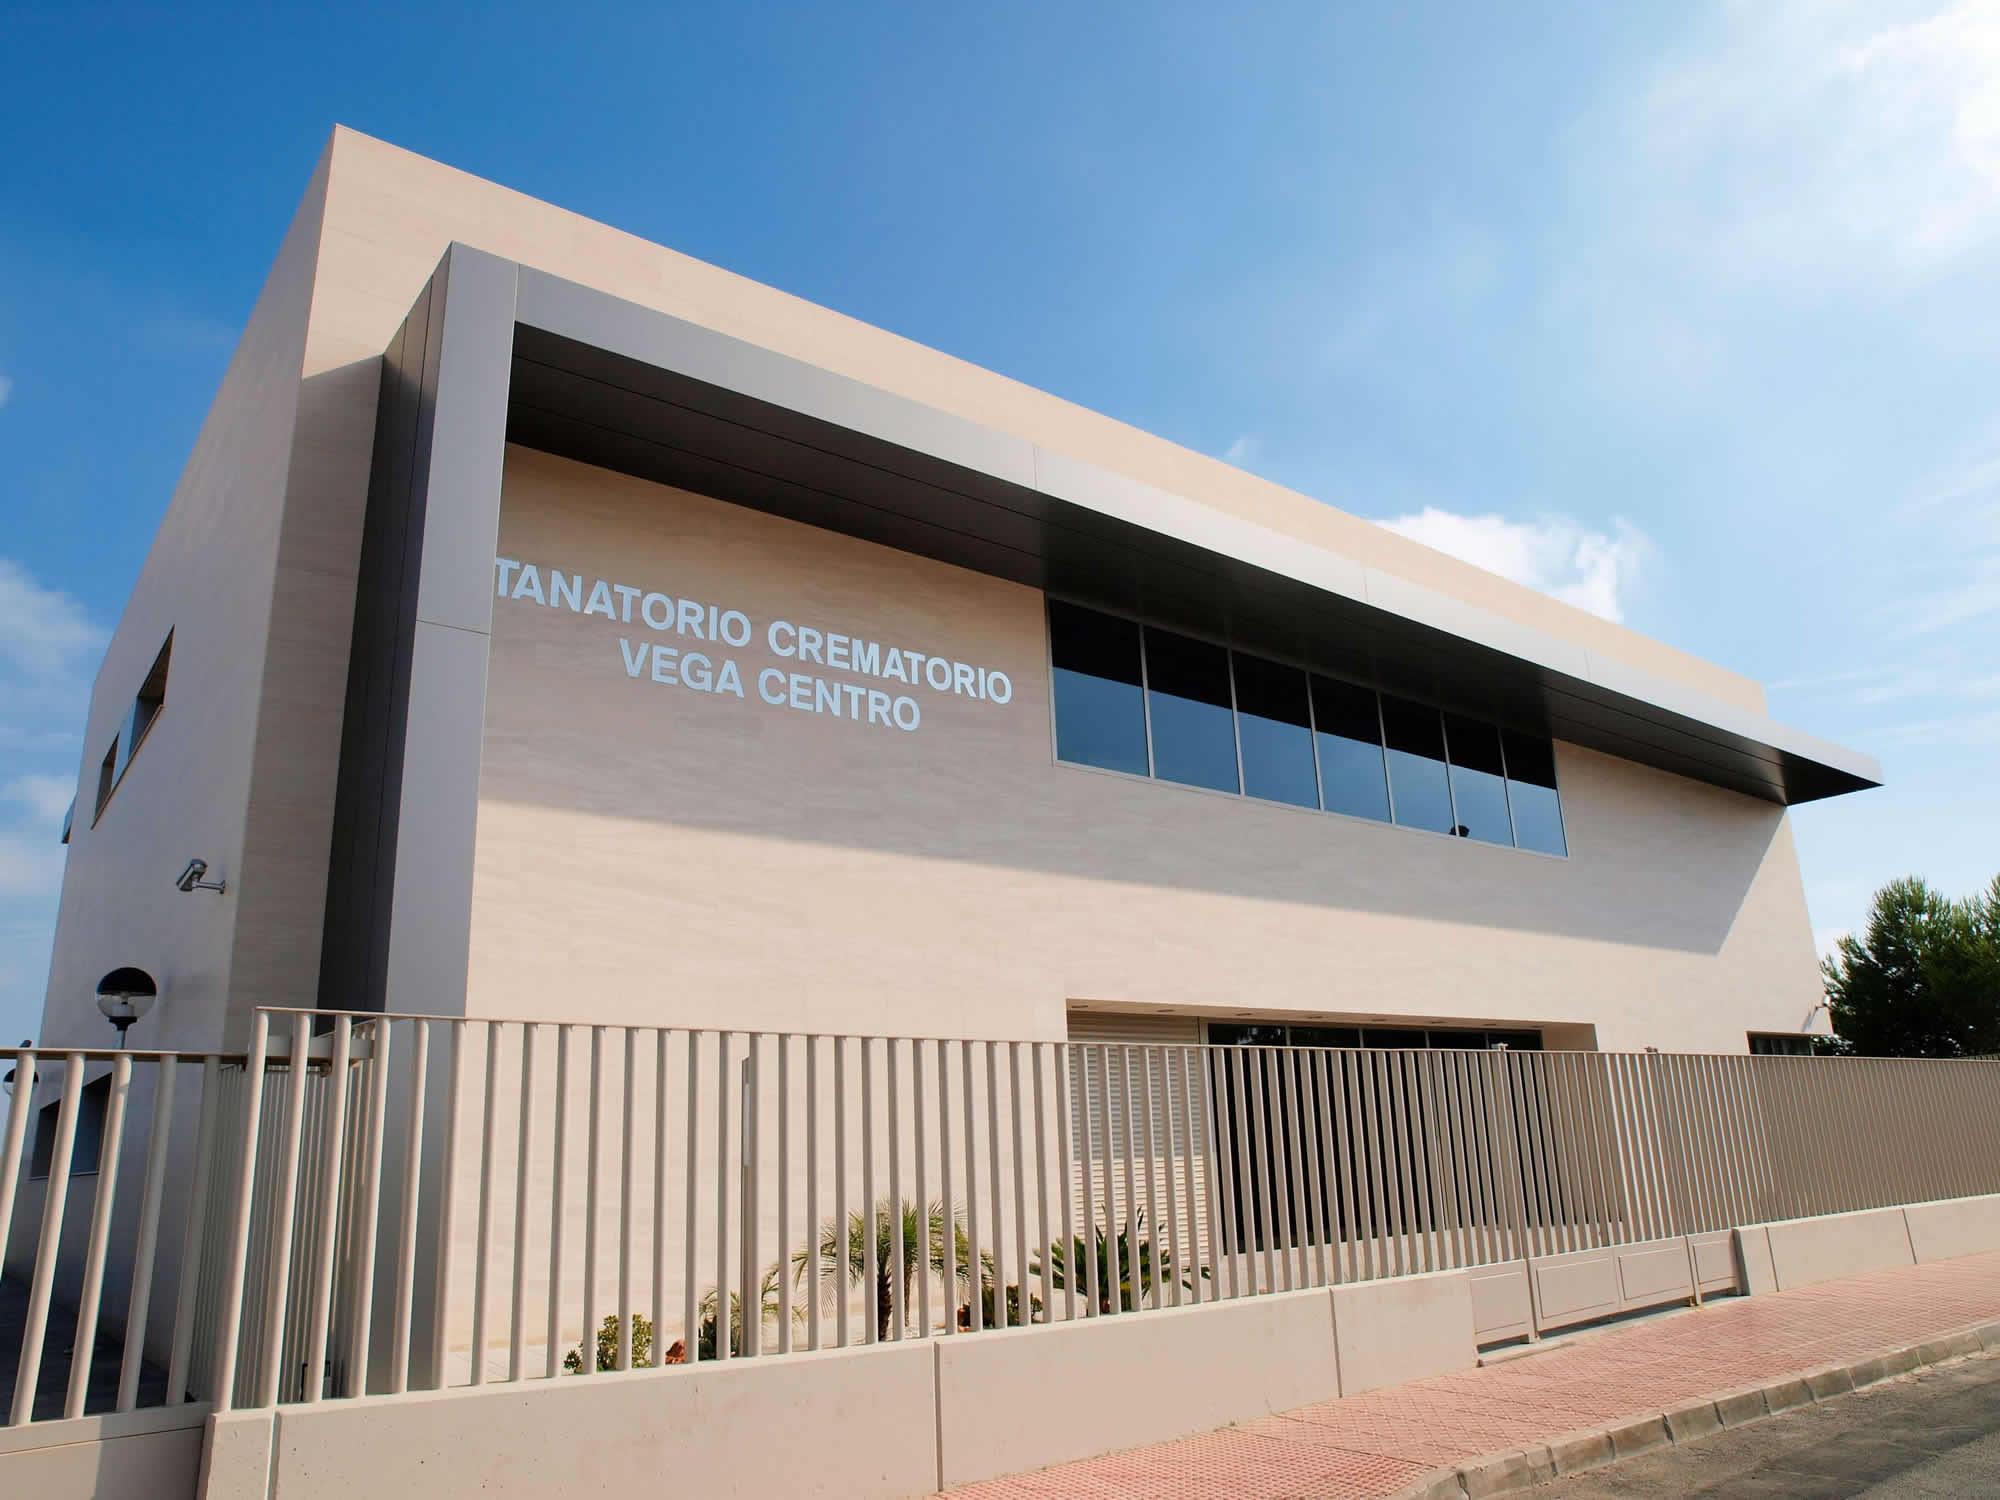 Tanatorio Crematorio Vega Centro